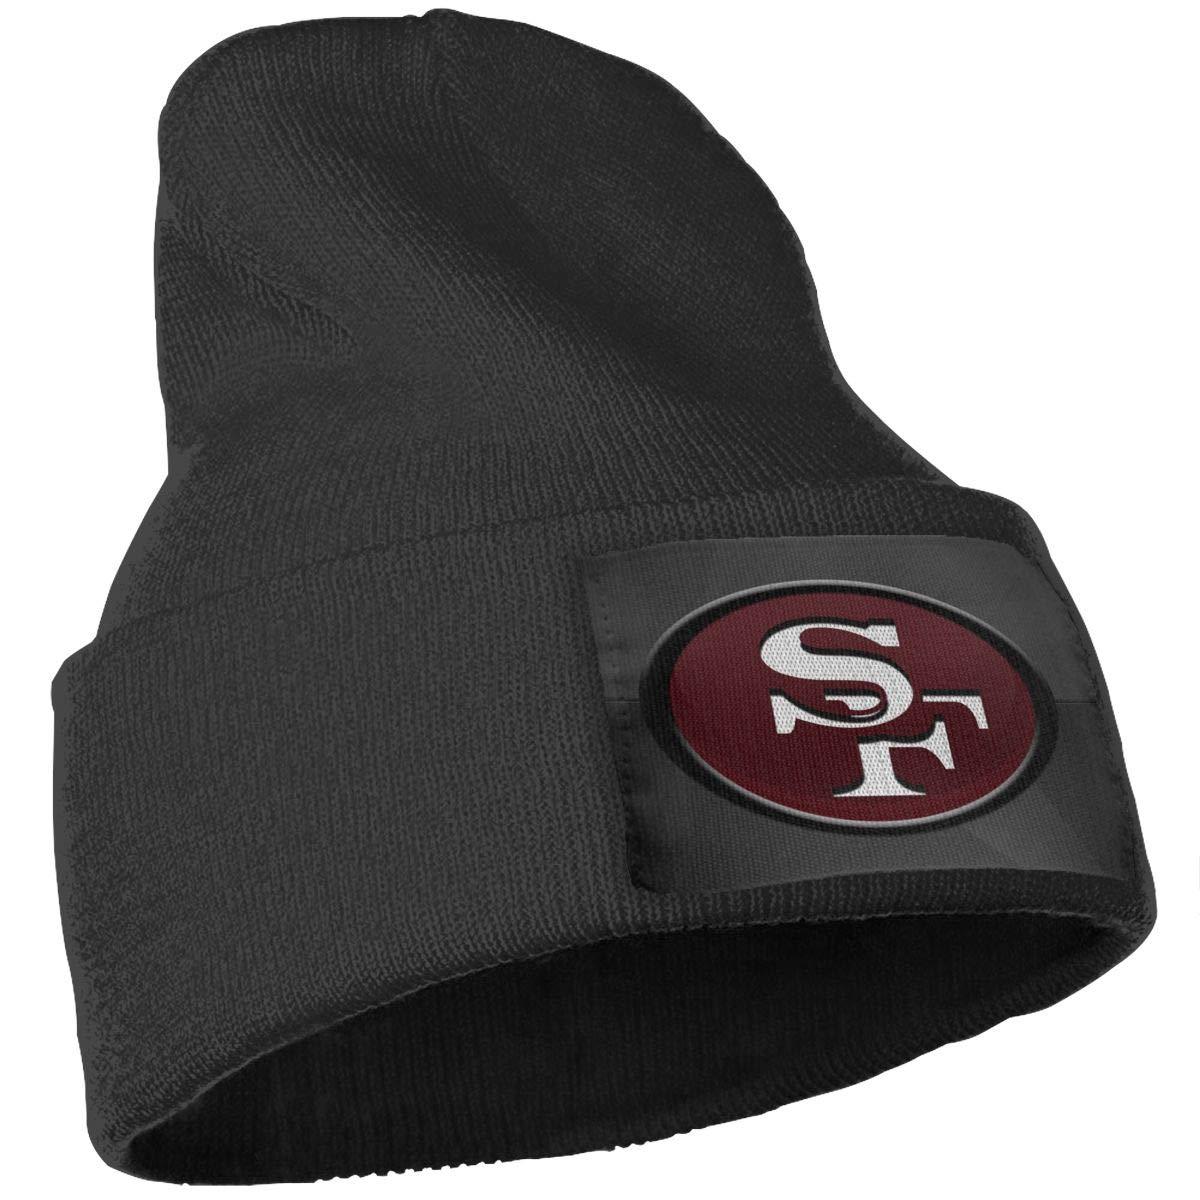 Black StubWandabs Unisex Adult Knit Hat Cap San Francisco 49ers Wallpaper Warm Winter Hats